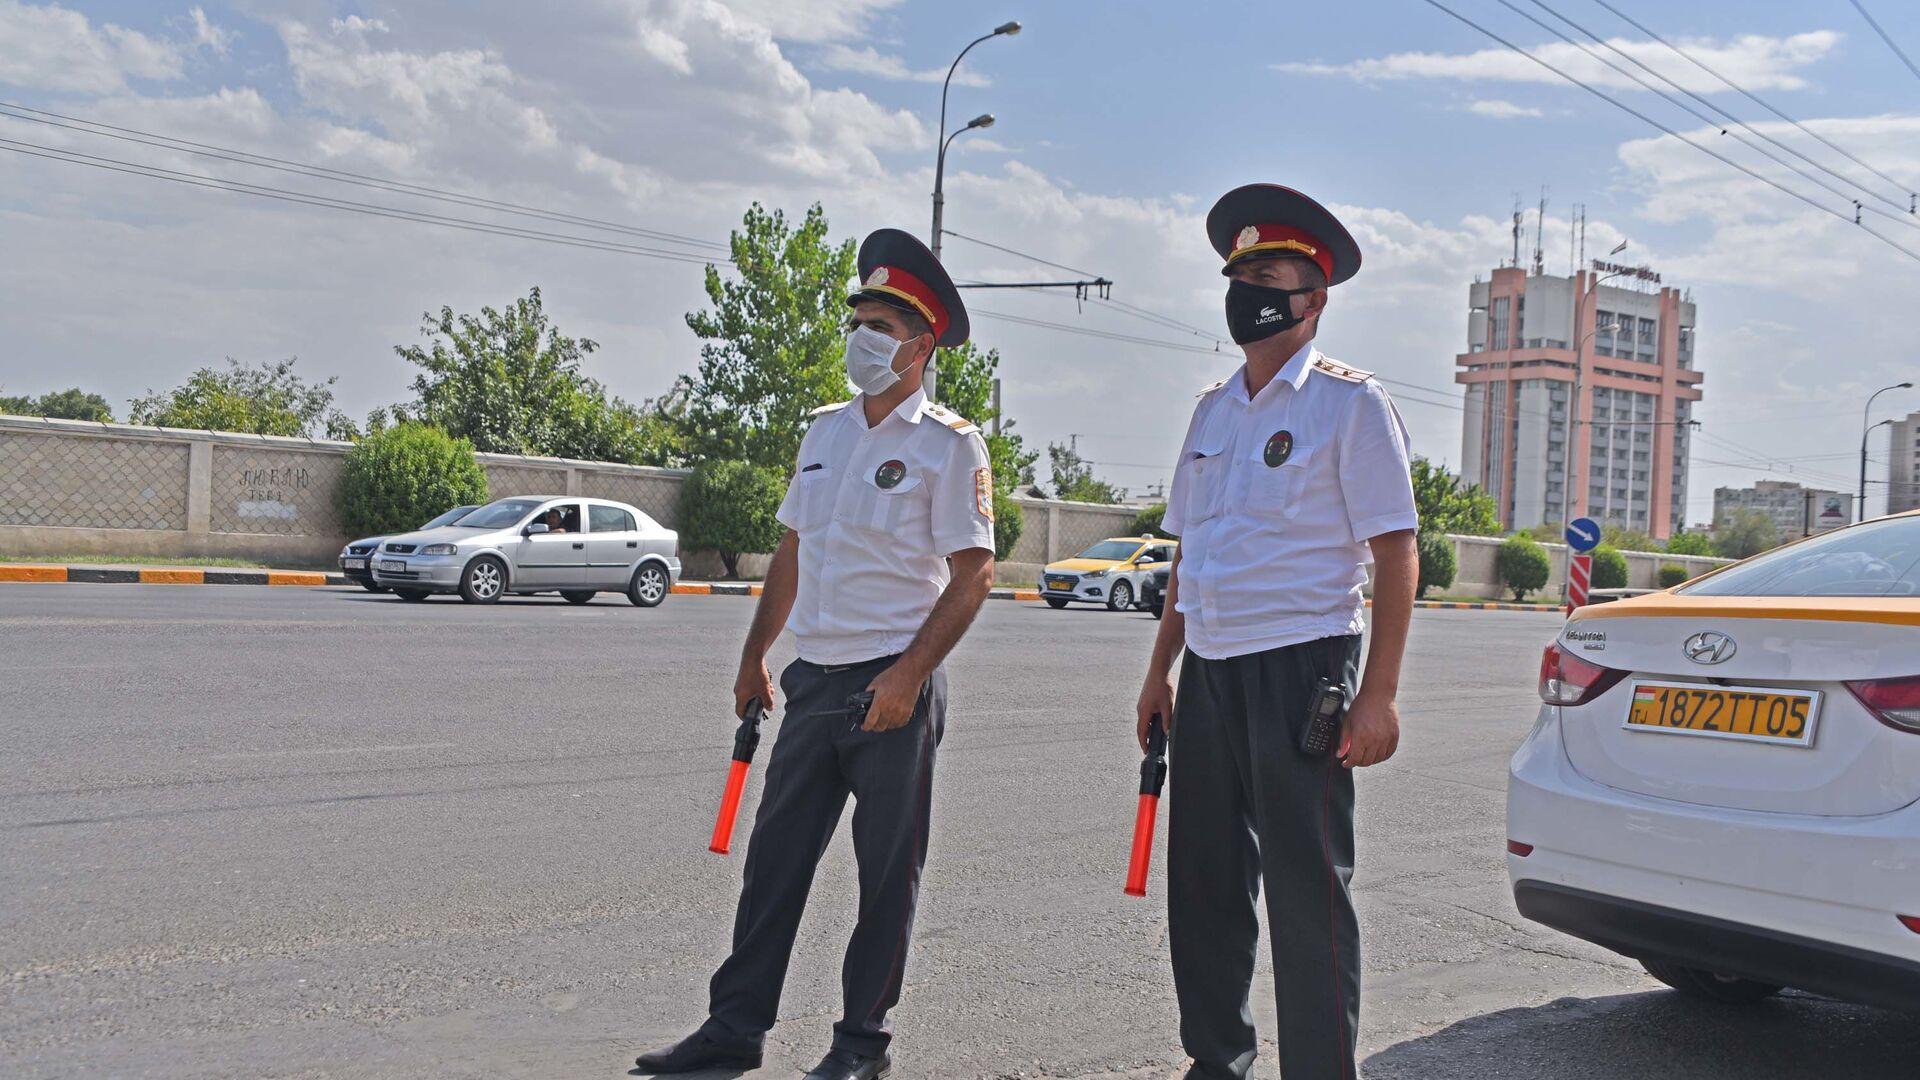 Сотрудники милиции на посту в Душанбе - Sputnik Таджикистан, 1920, 09.06.2021